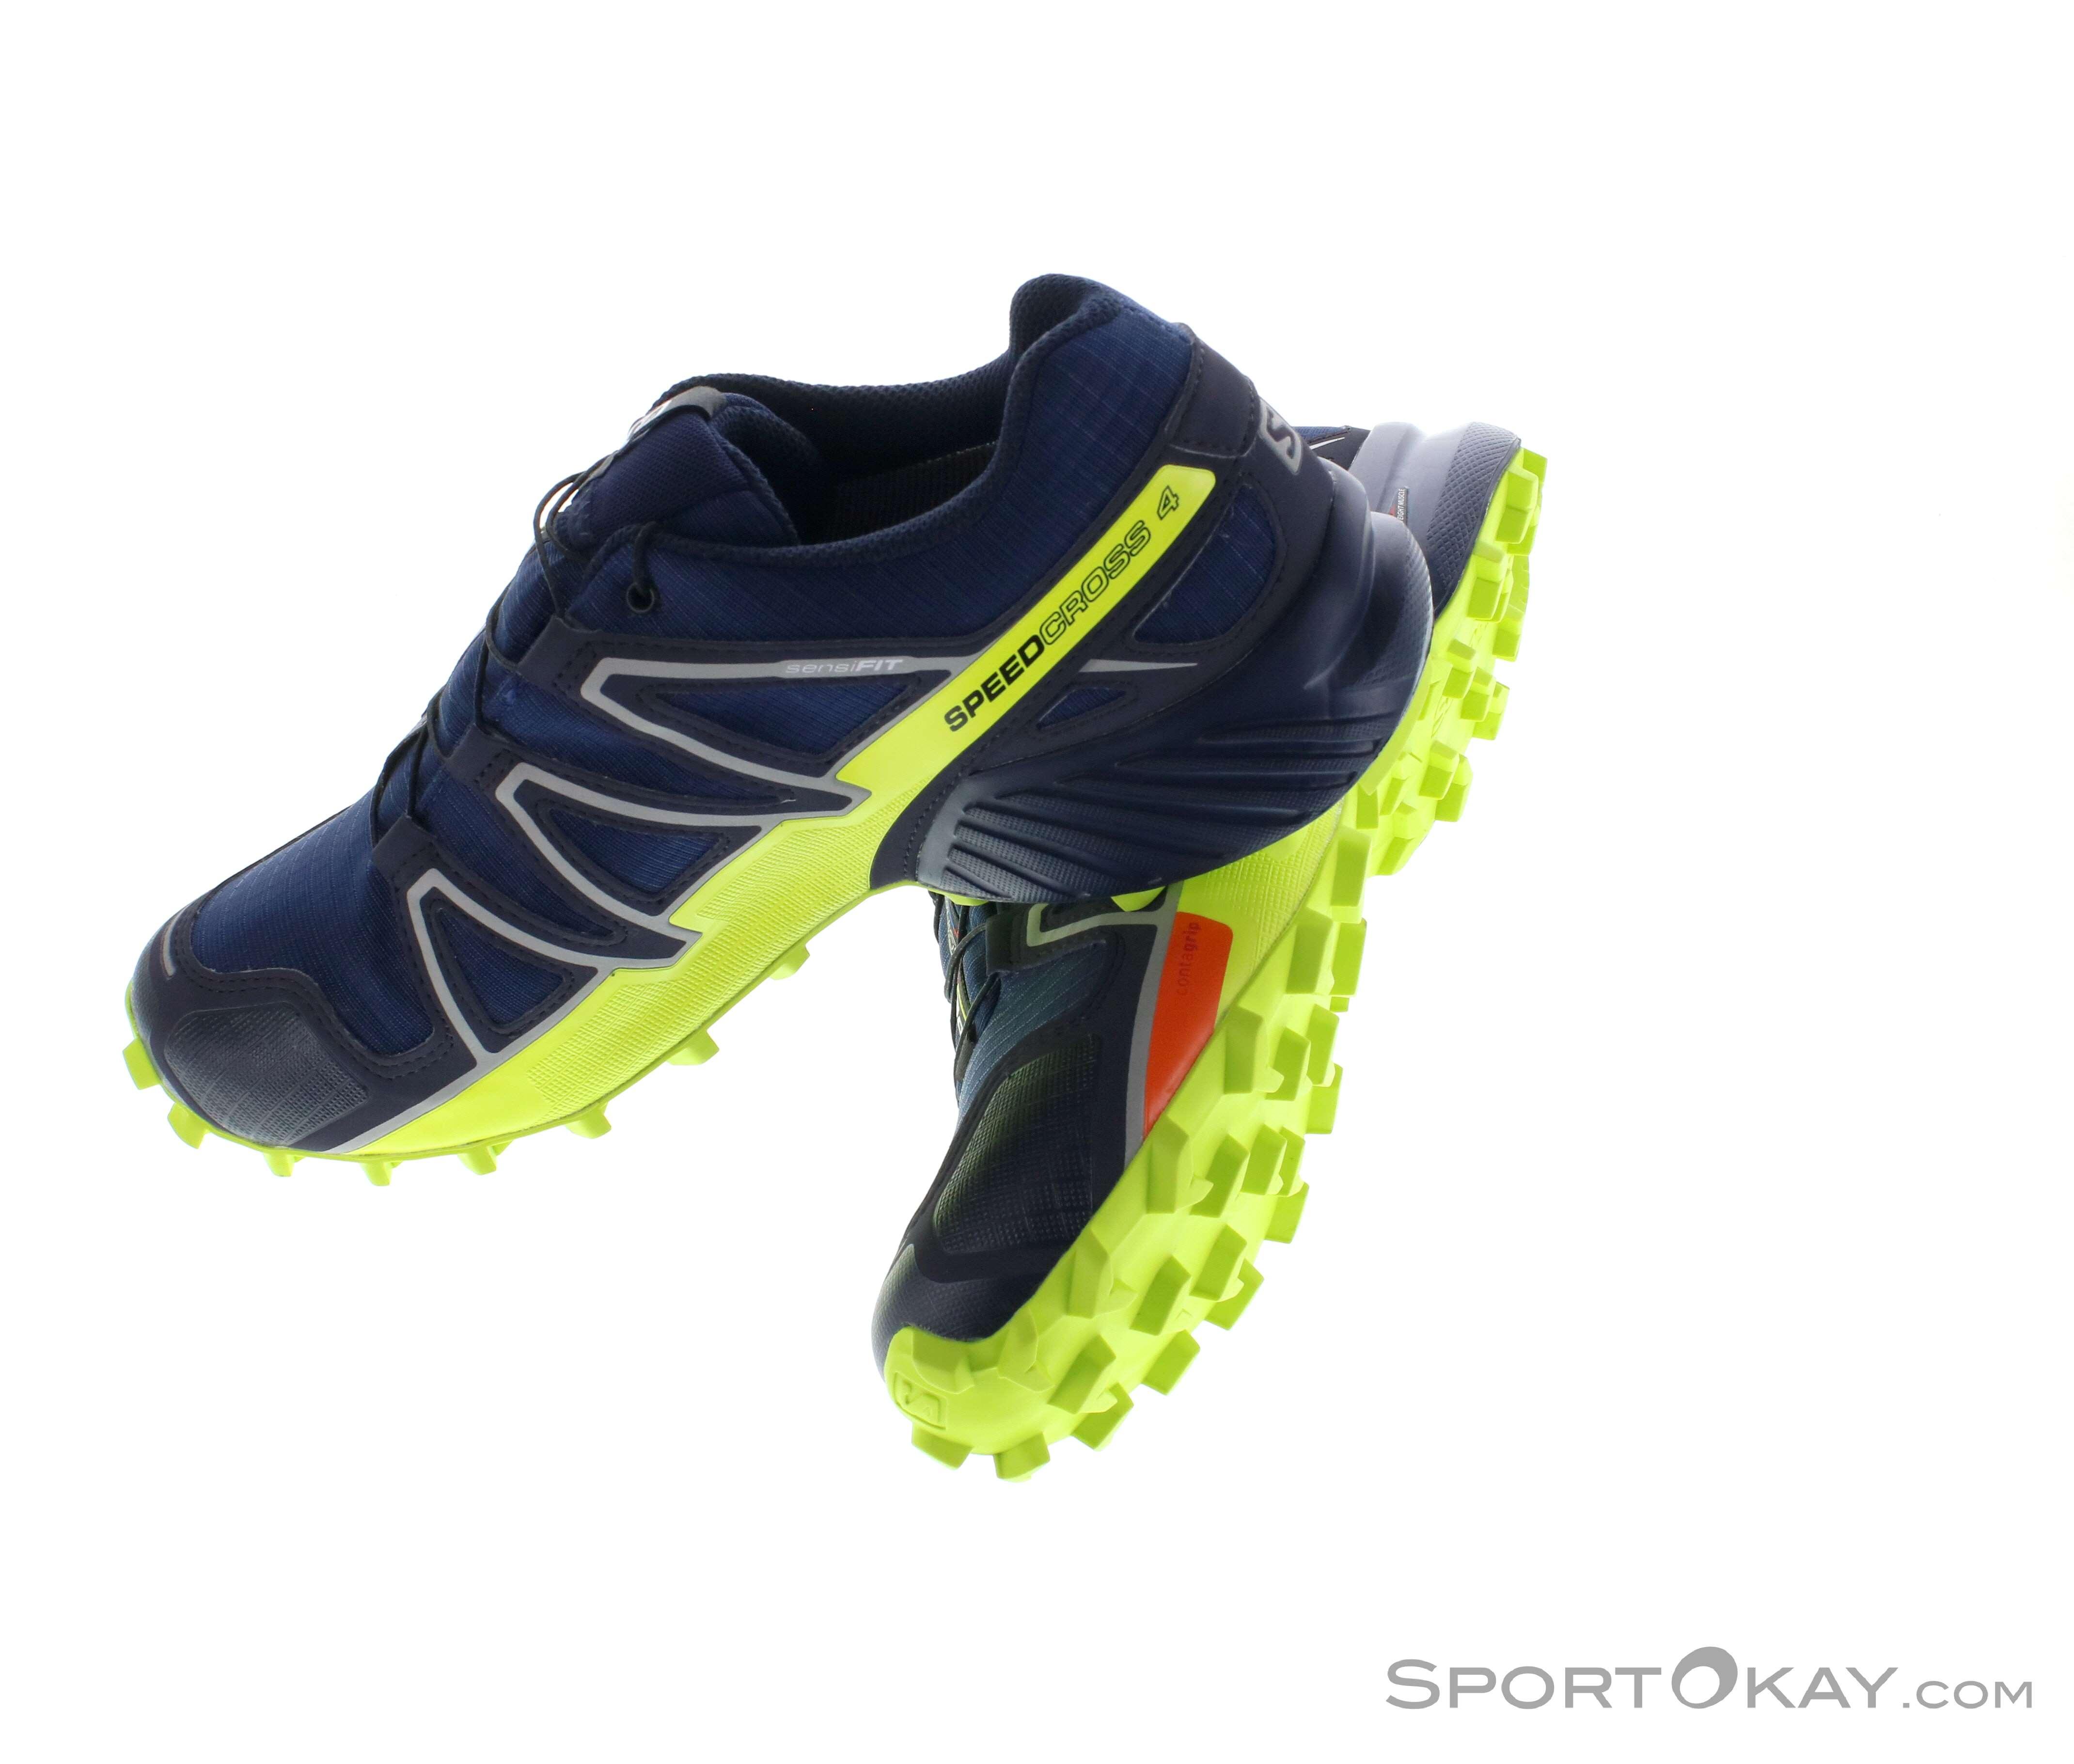 Speedcross Scarpe Trail Gore Salomon 4 Tex Da Uomo Running Pzx4wF4T